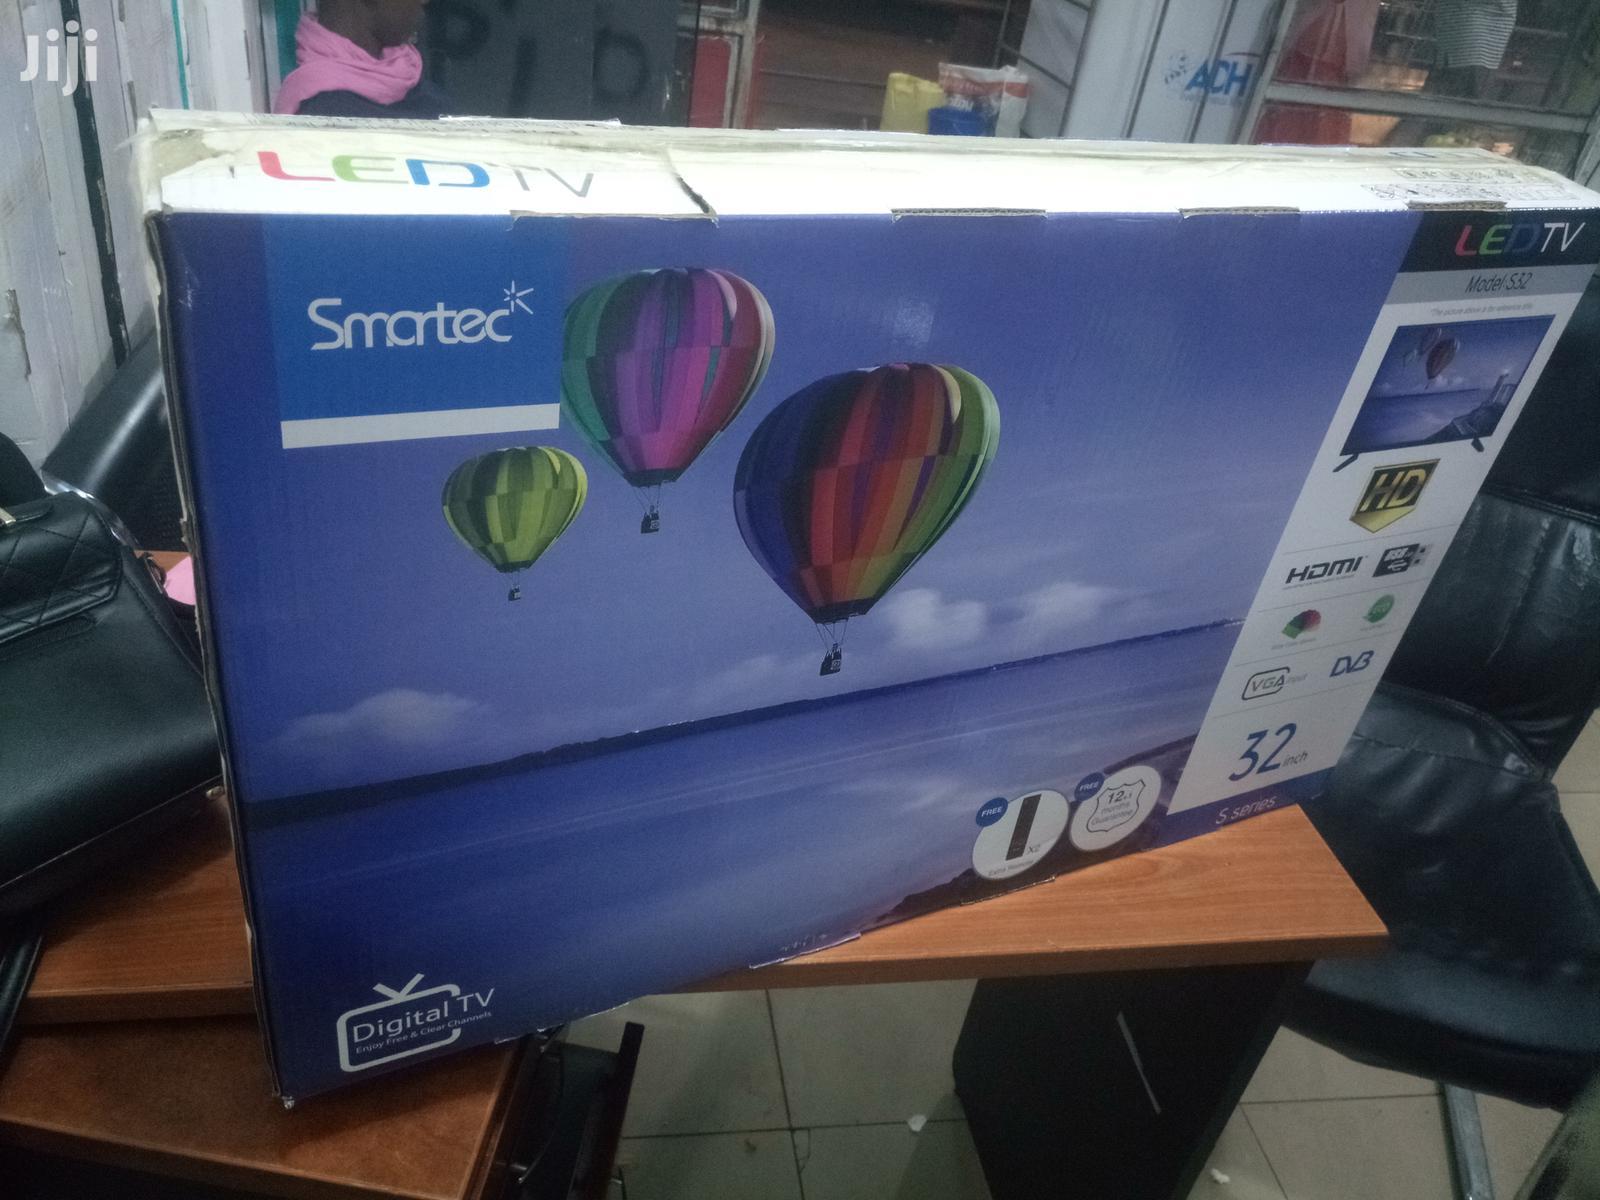 Smartec Flat Screen Digital TV 32 Inches | TV & DVD Equipment for sale in Kampala, Central Region, Uganda